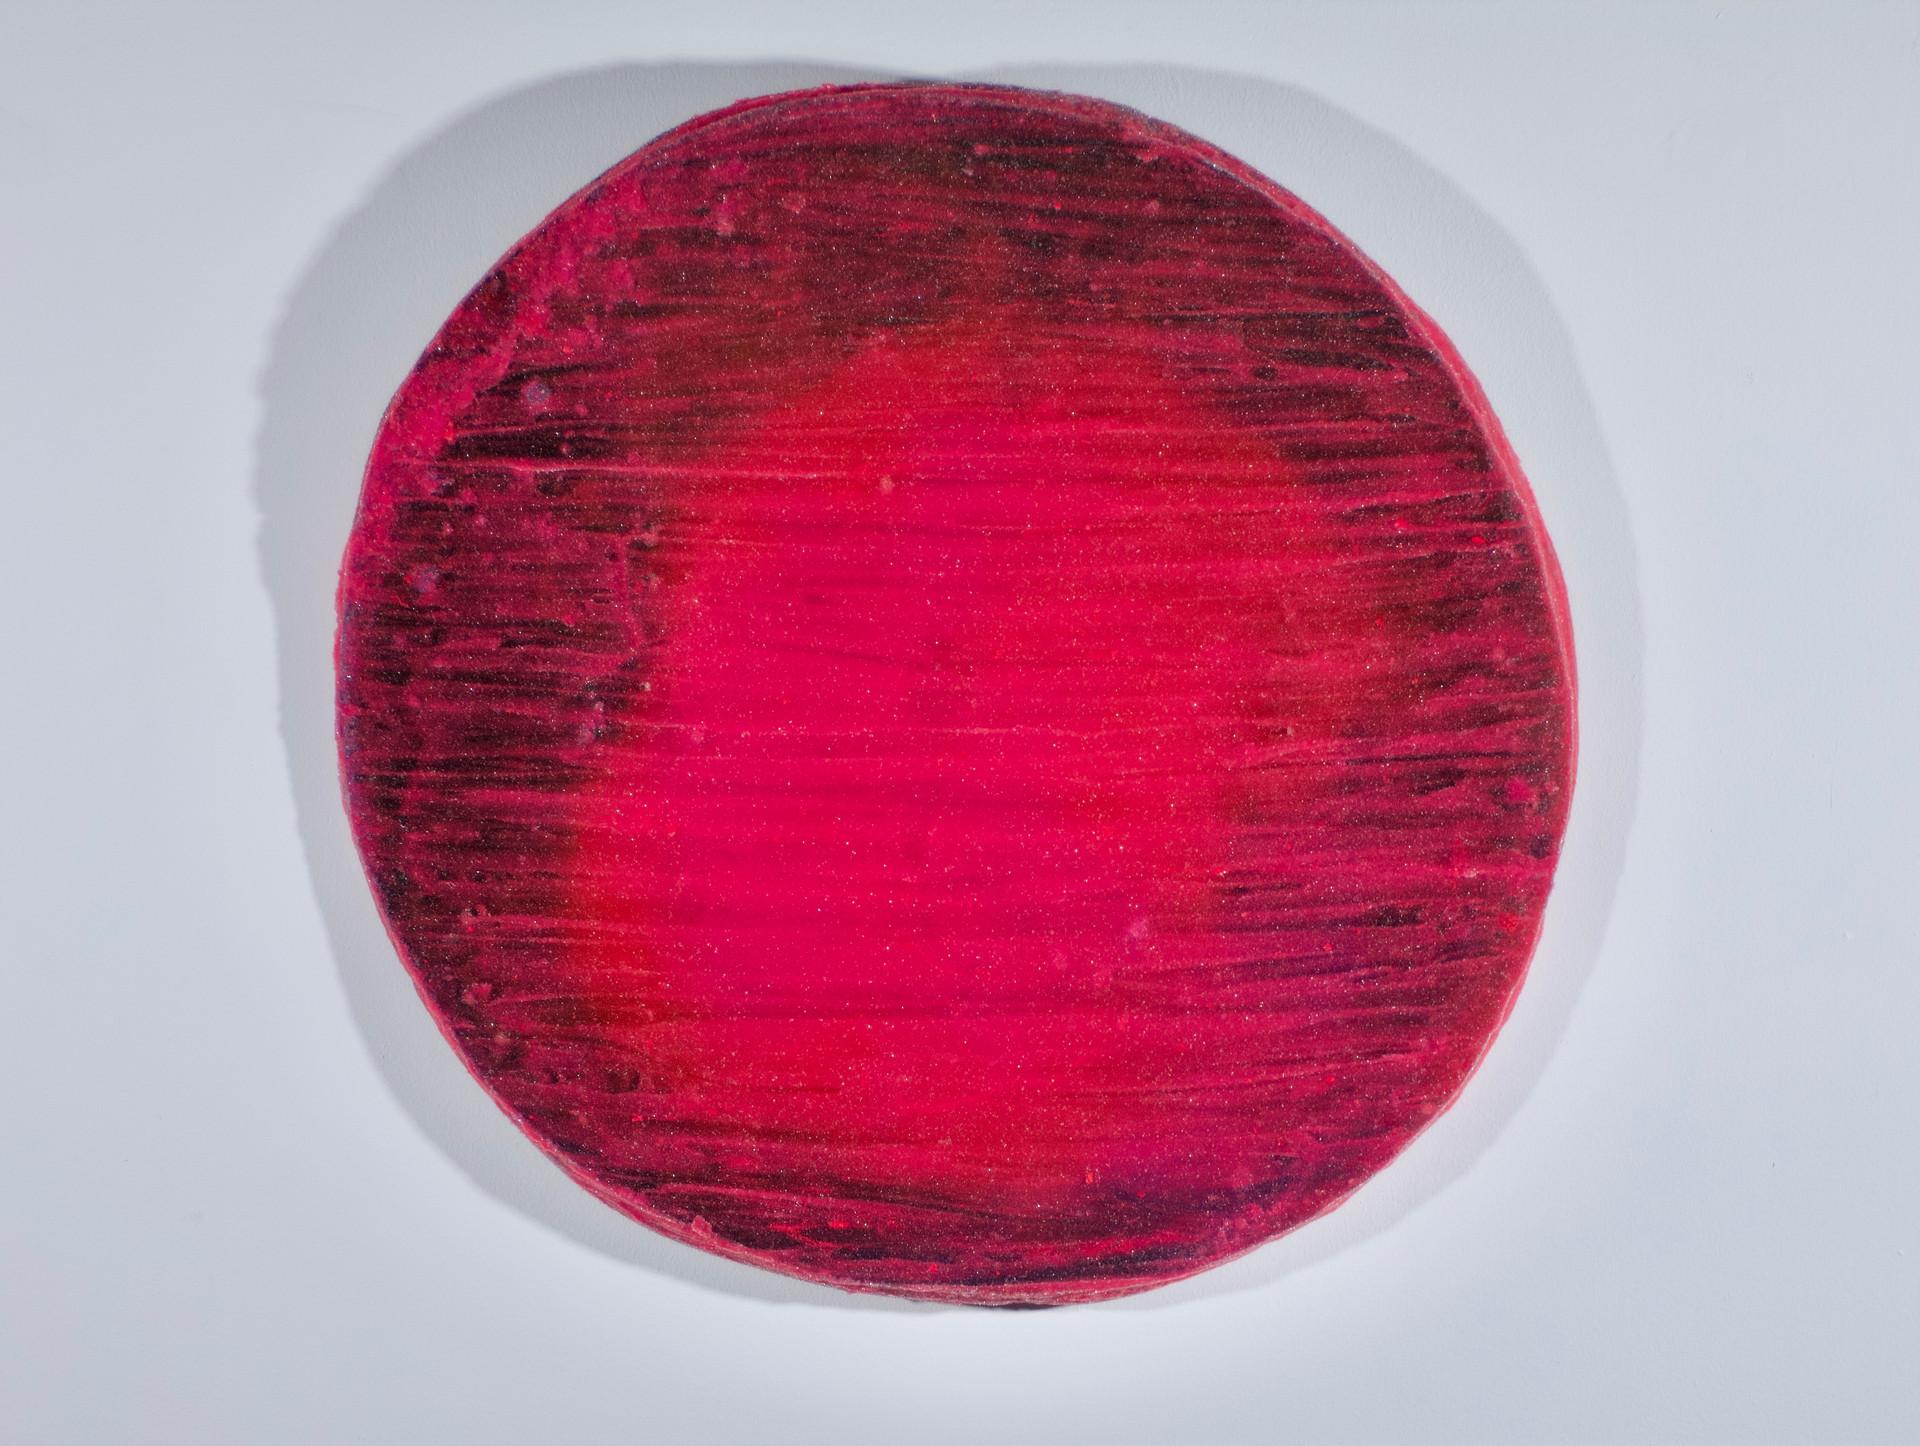 "TWELVE (Mold) 2020 21"" X 21"" Available $400  casting resin, epoxy resin, fiberglass resin,plexiglass dust, polysufide rubber, acrylic medium, acrylic paint, ink, dye, synthetic amorphous silicone dioxide, glass oxide"